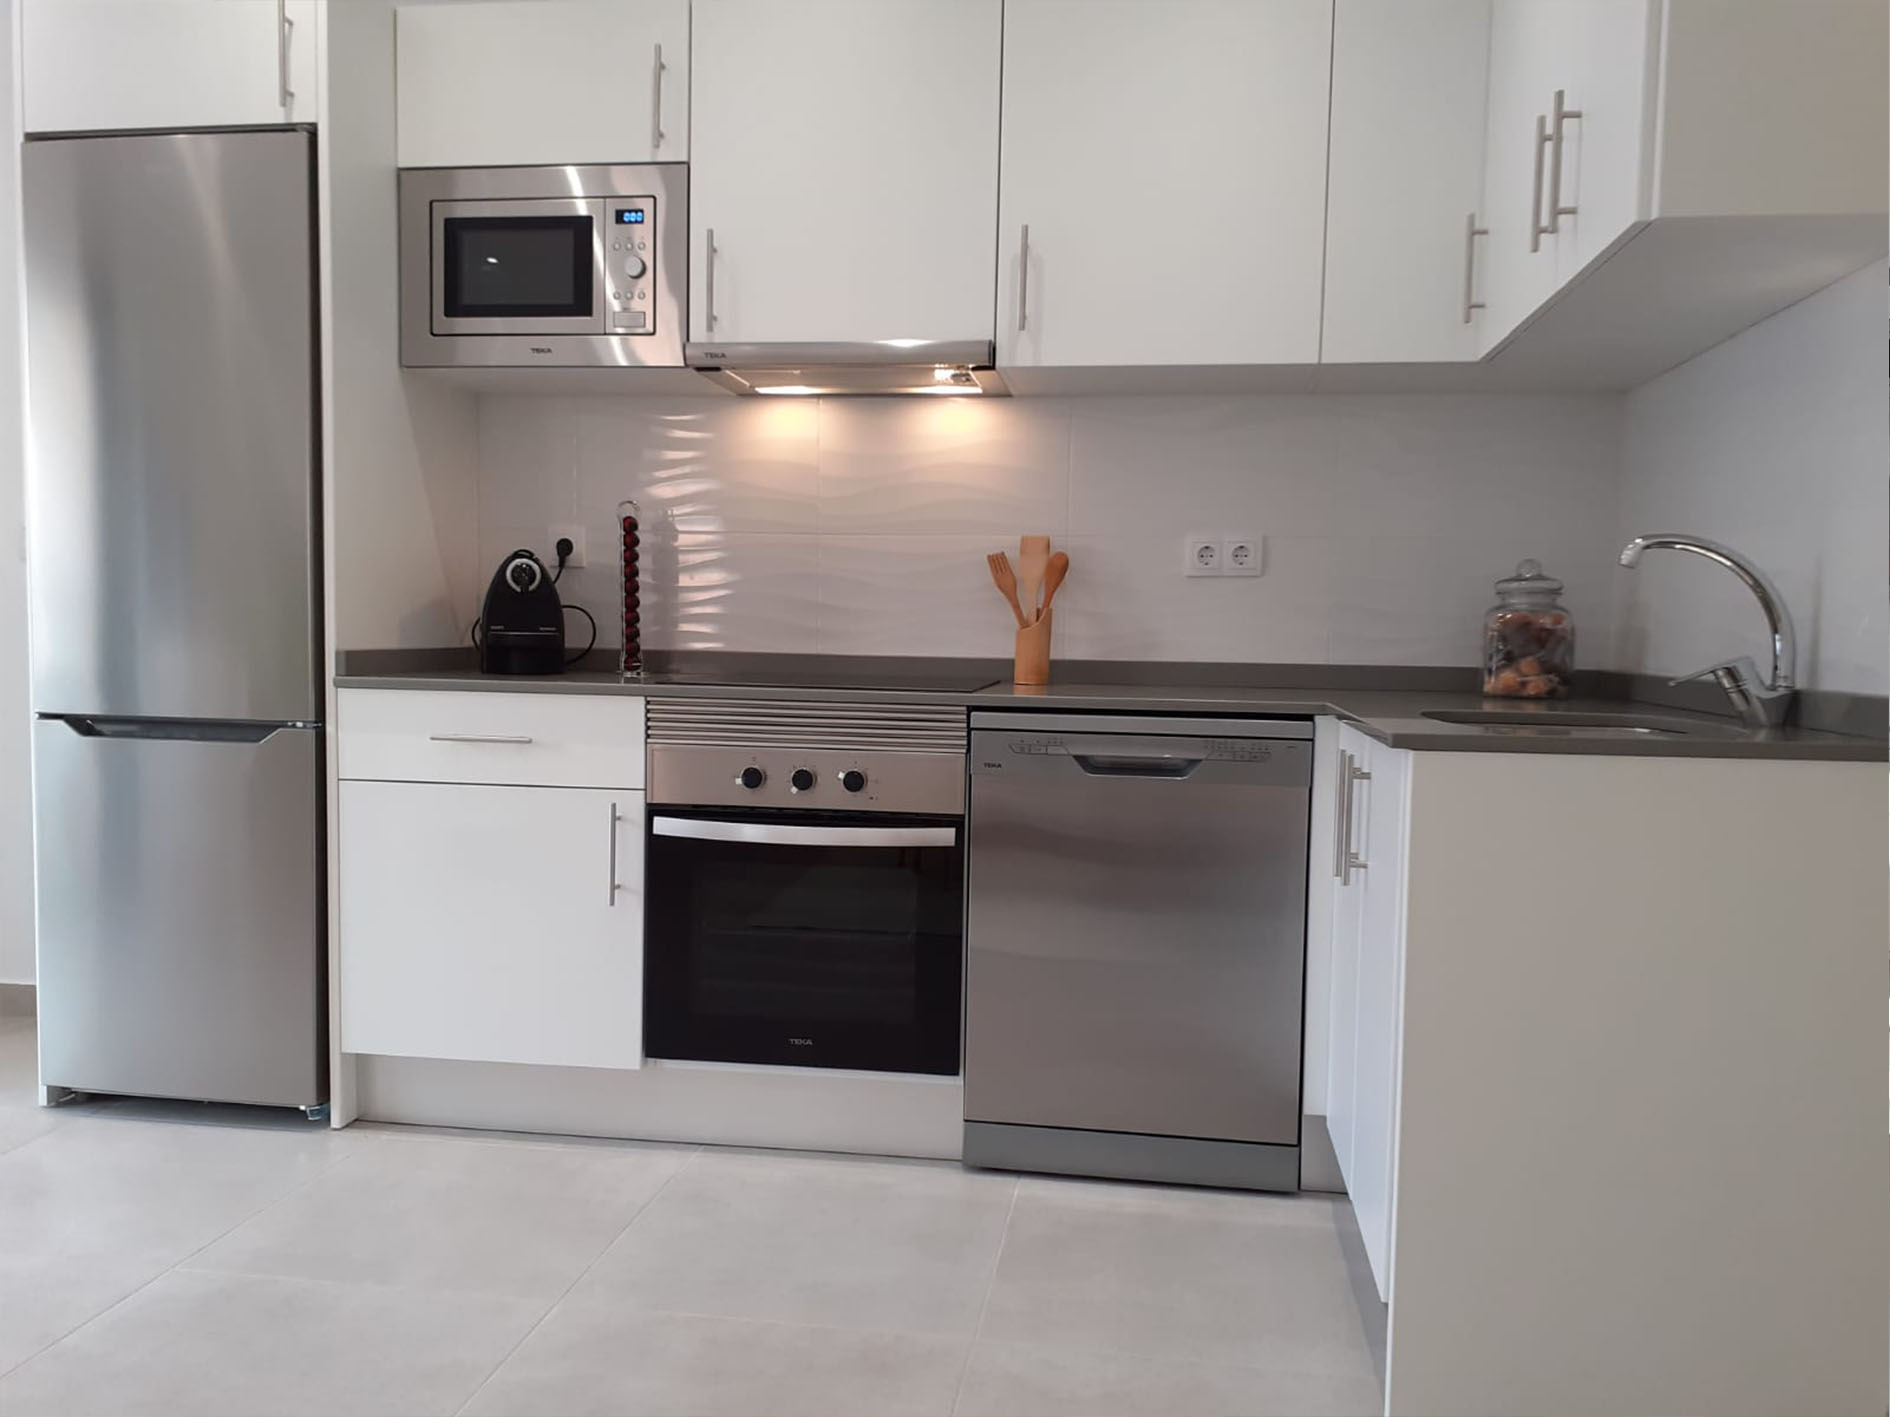 immobilier neuf espagne costa blanca on-d13 levansur home three cuisine